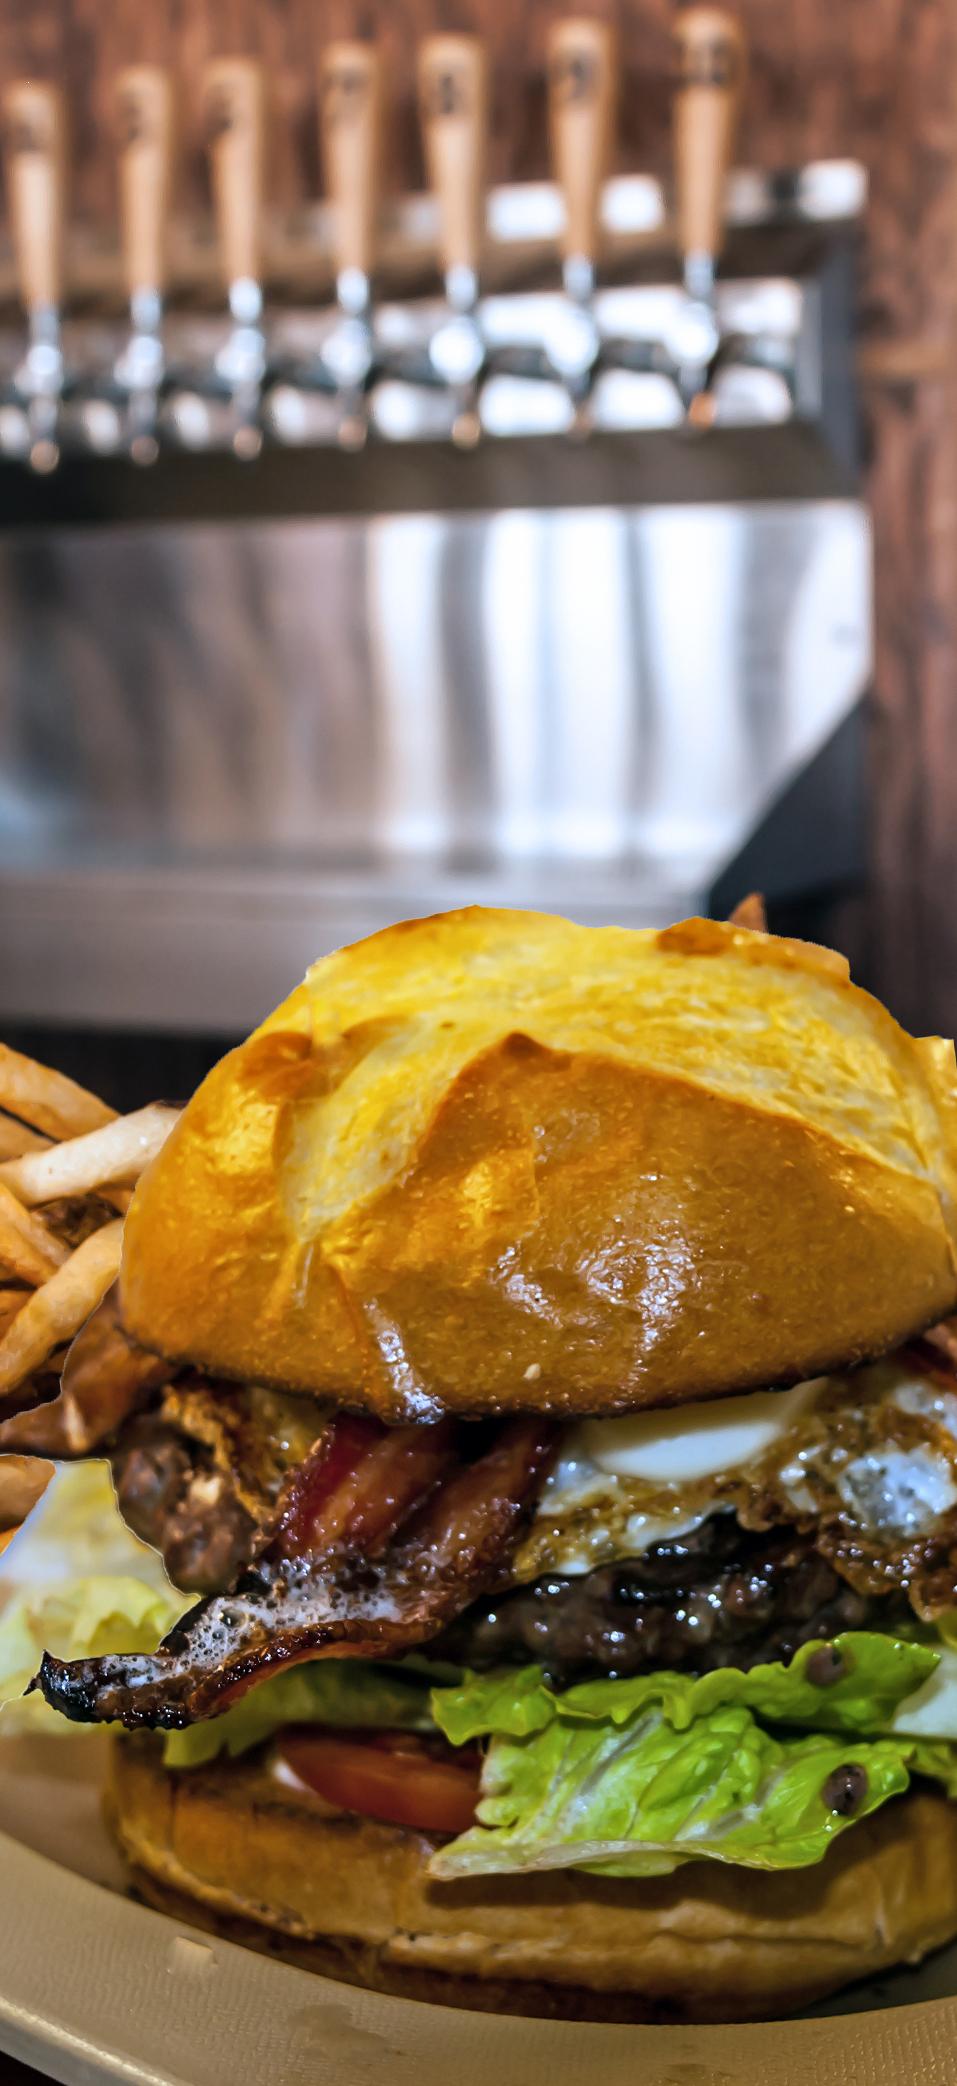 Shavano Burger -